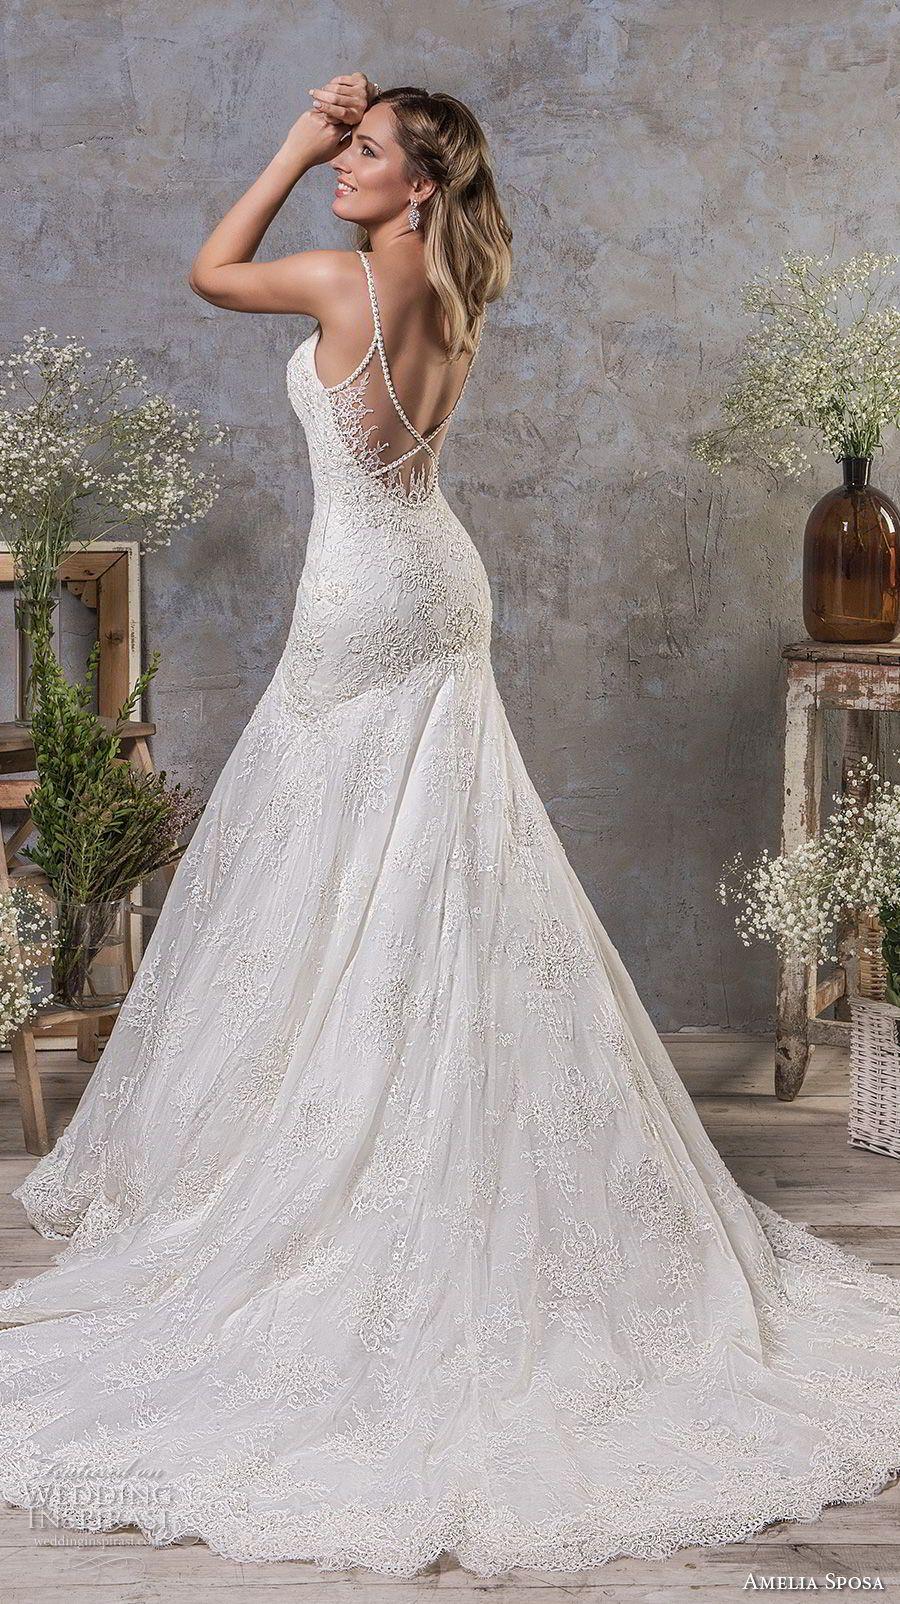 Amelia sposa fall wedding dresses bridal gowns pinterest